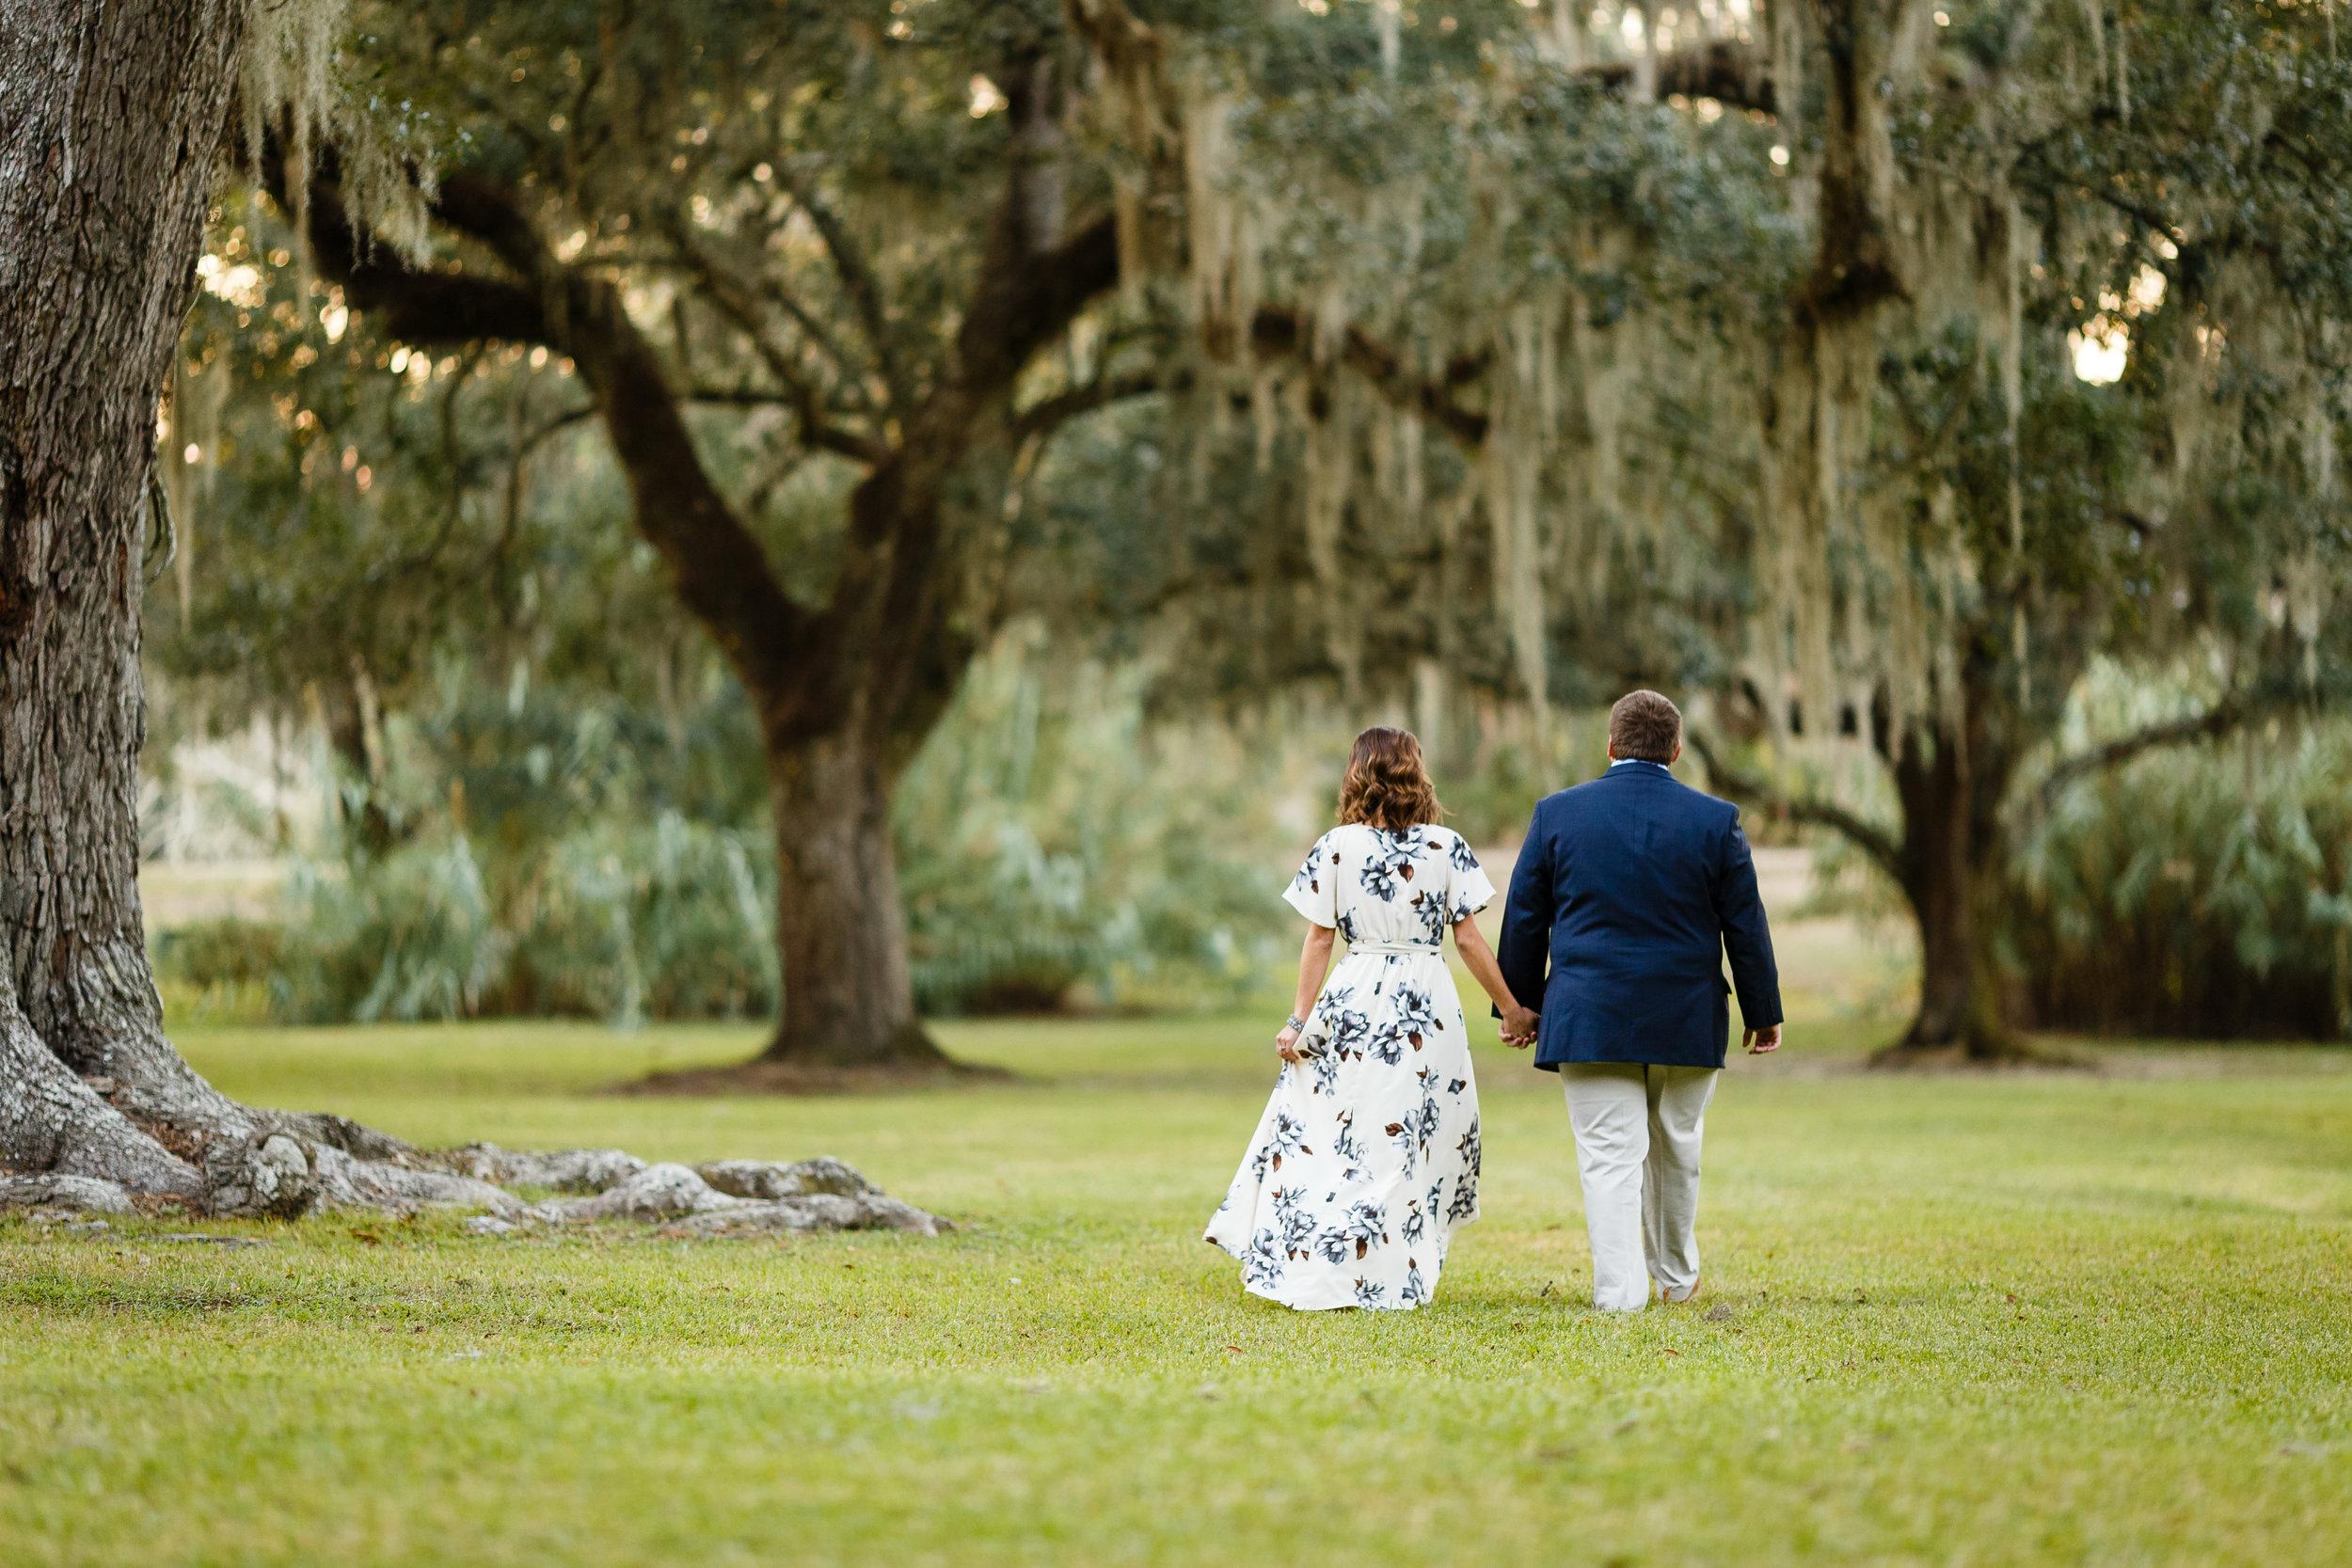 Youngsville-lafayette-portrait-family-wedding-photographer-9242.jpg